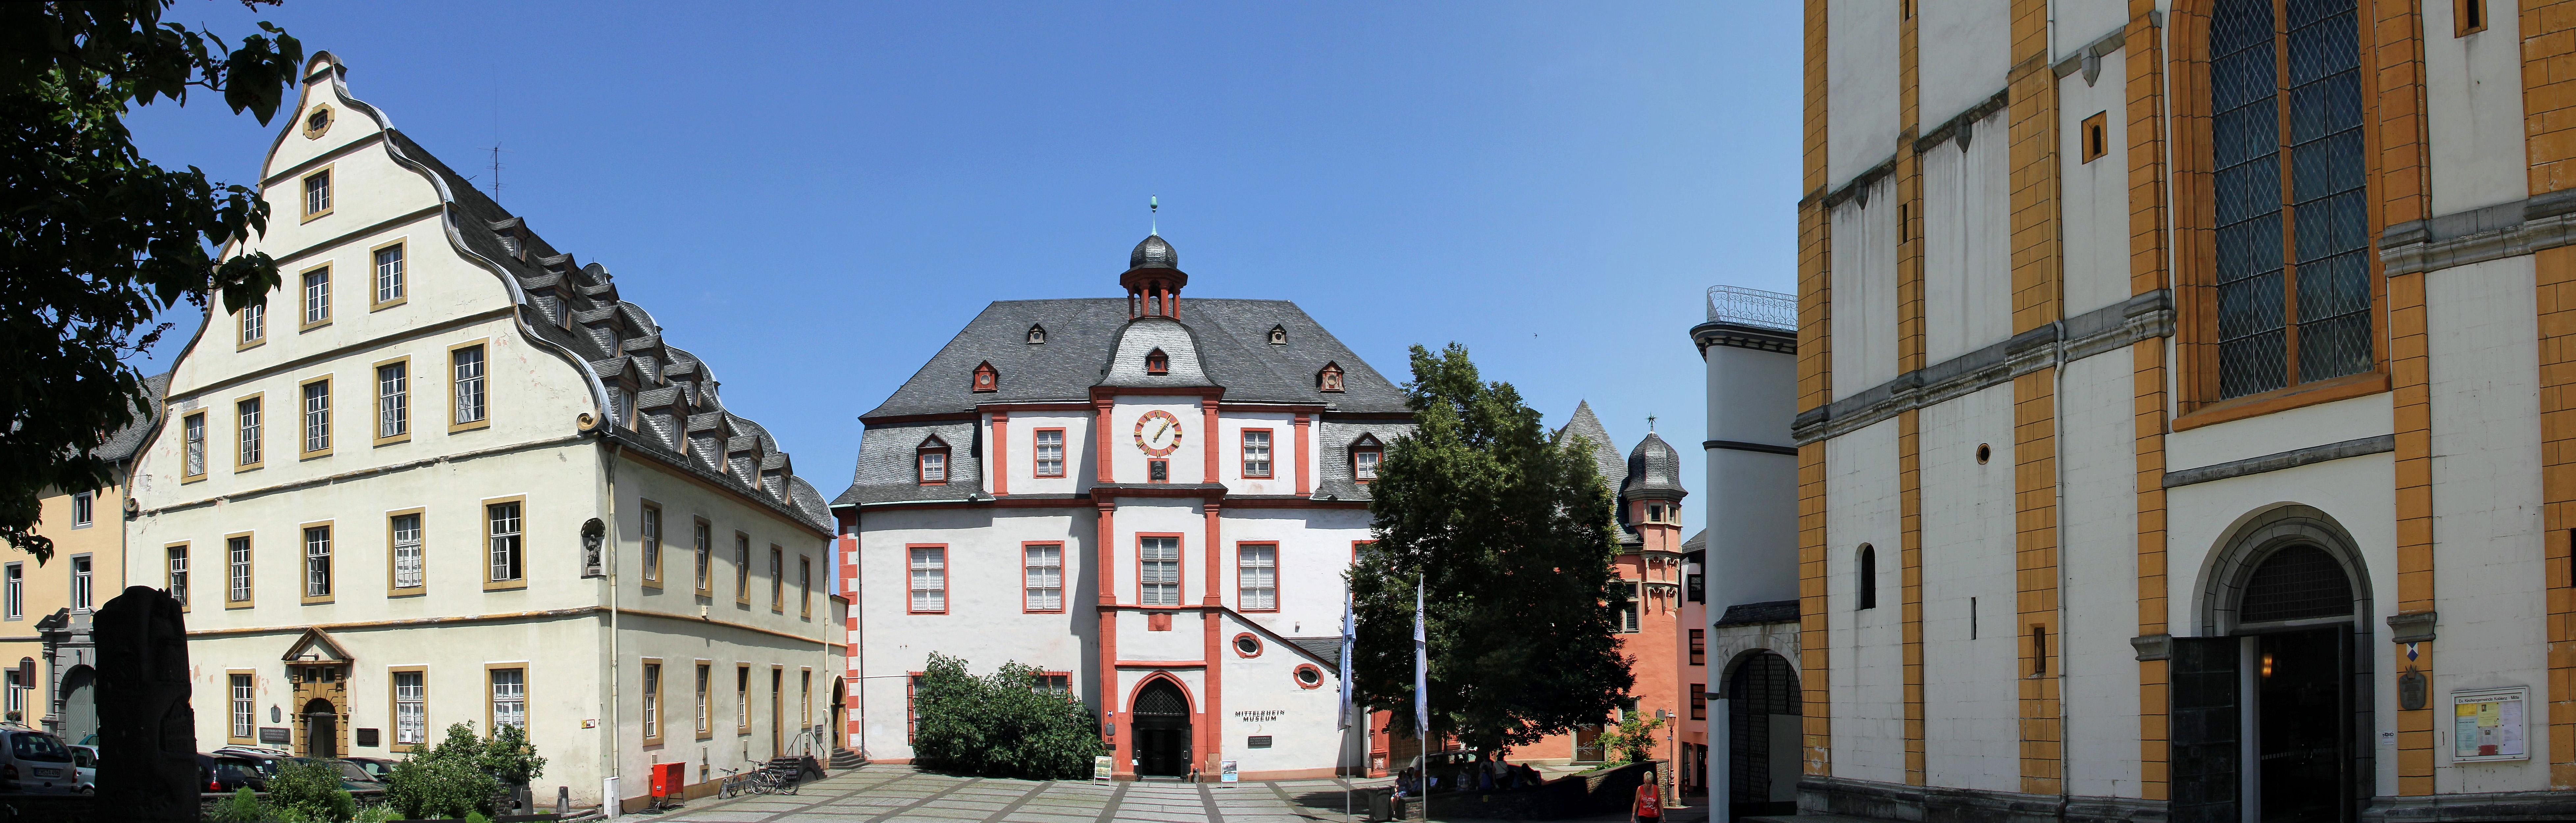 File:Koblenz im Buga-Jahr 2011 - Panorama Florinsmarkt.jpg - Wikimedia Commons